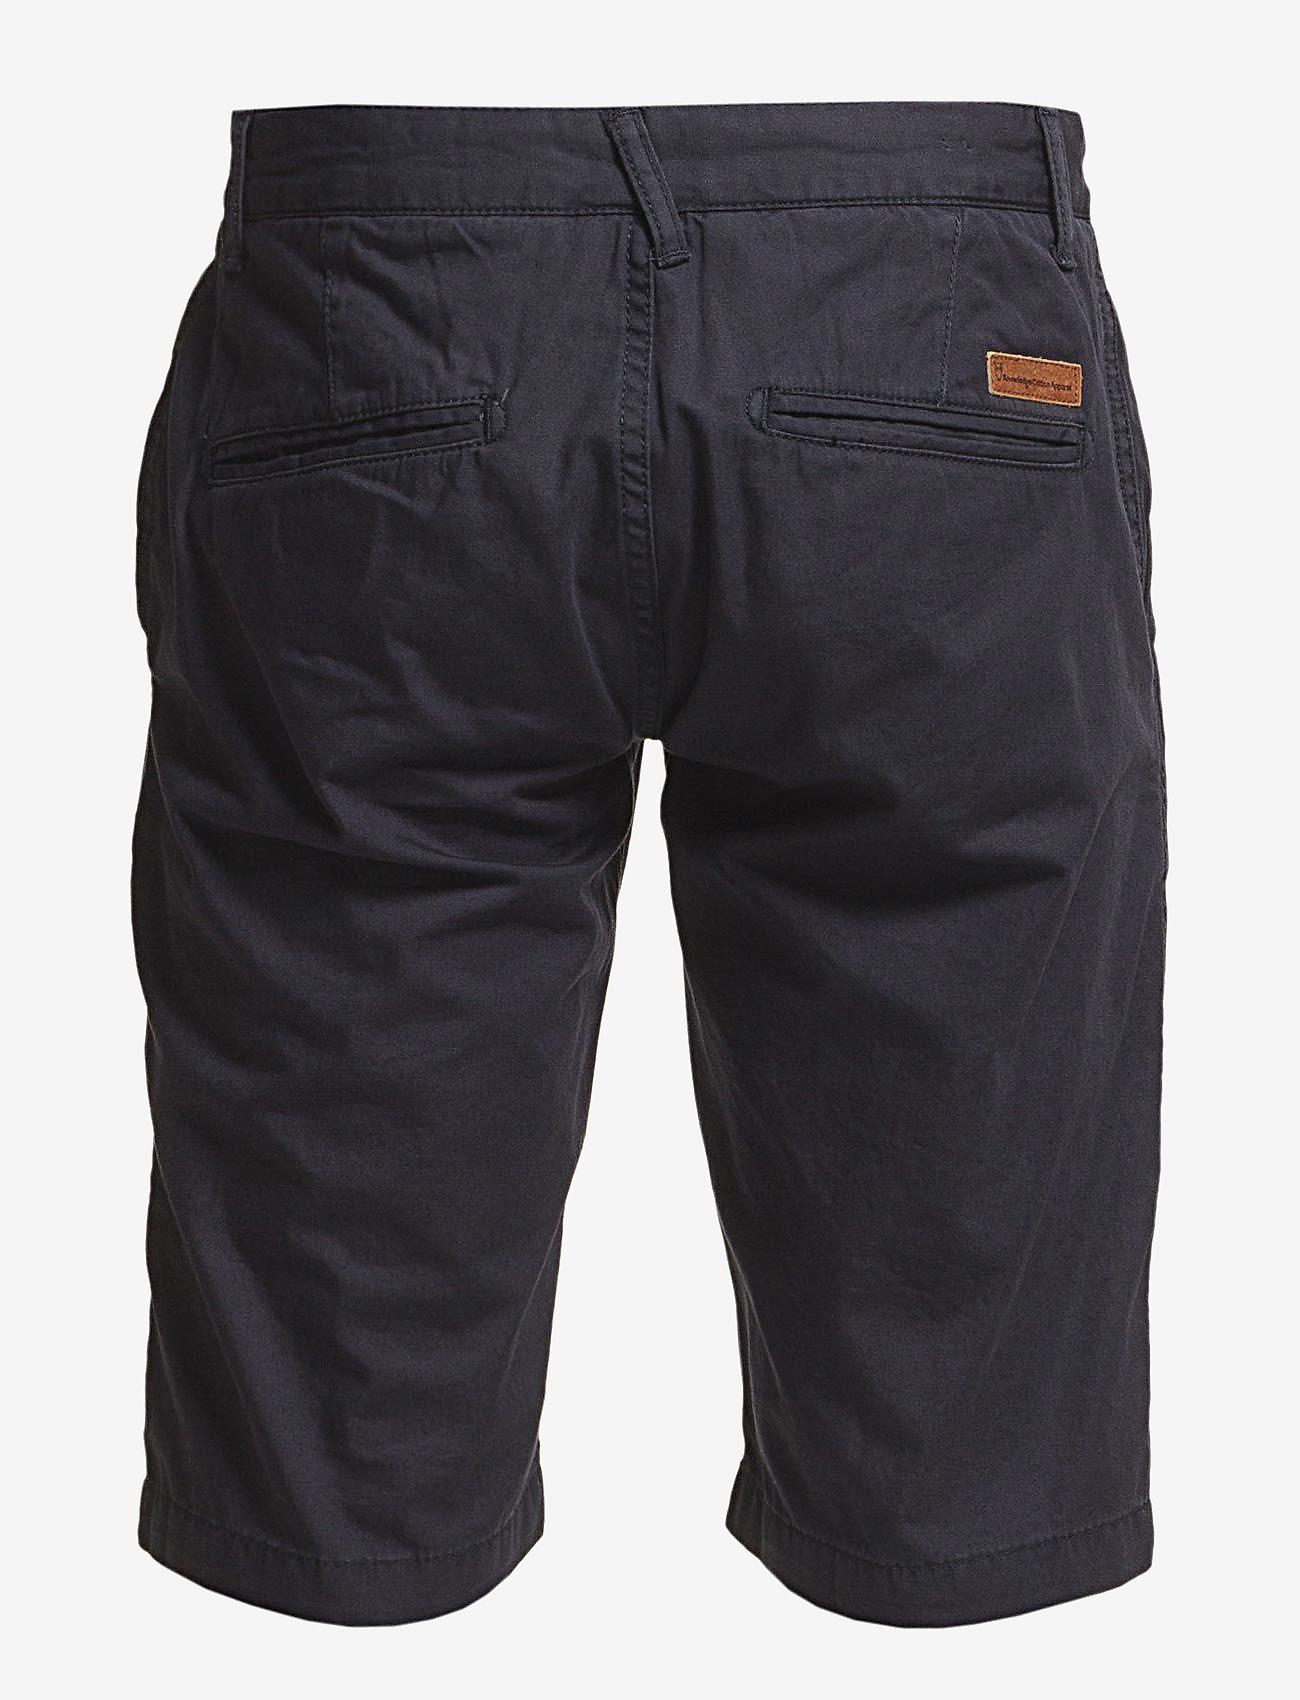 Knowledge Cotton Apparel - CHUCK chino shorts - apģērbs - total eclipse - 1